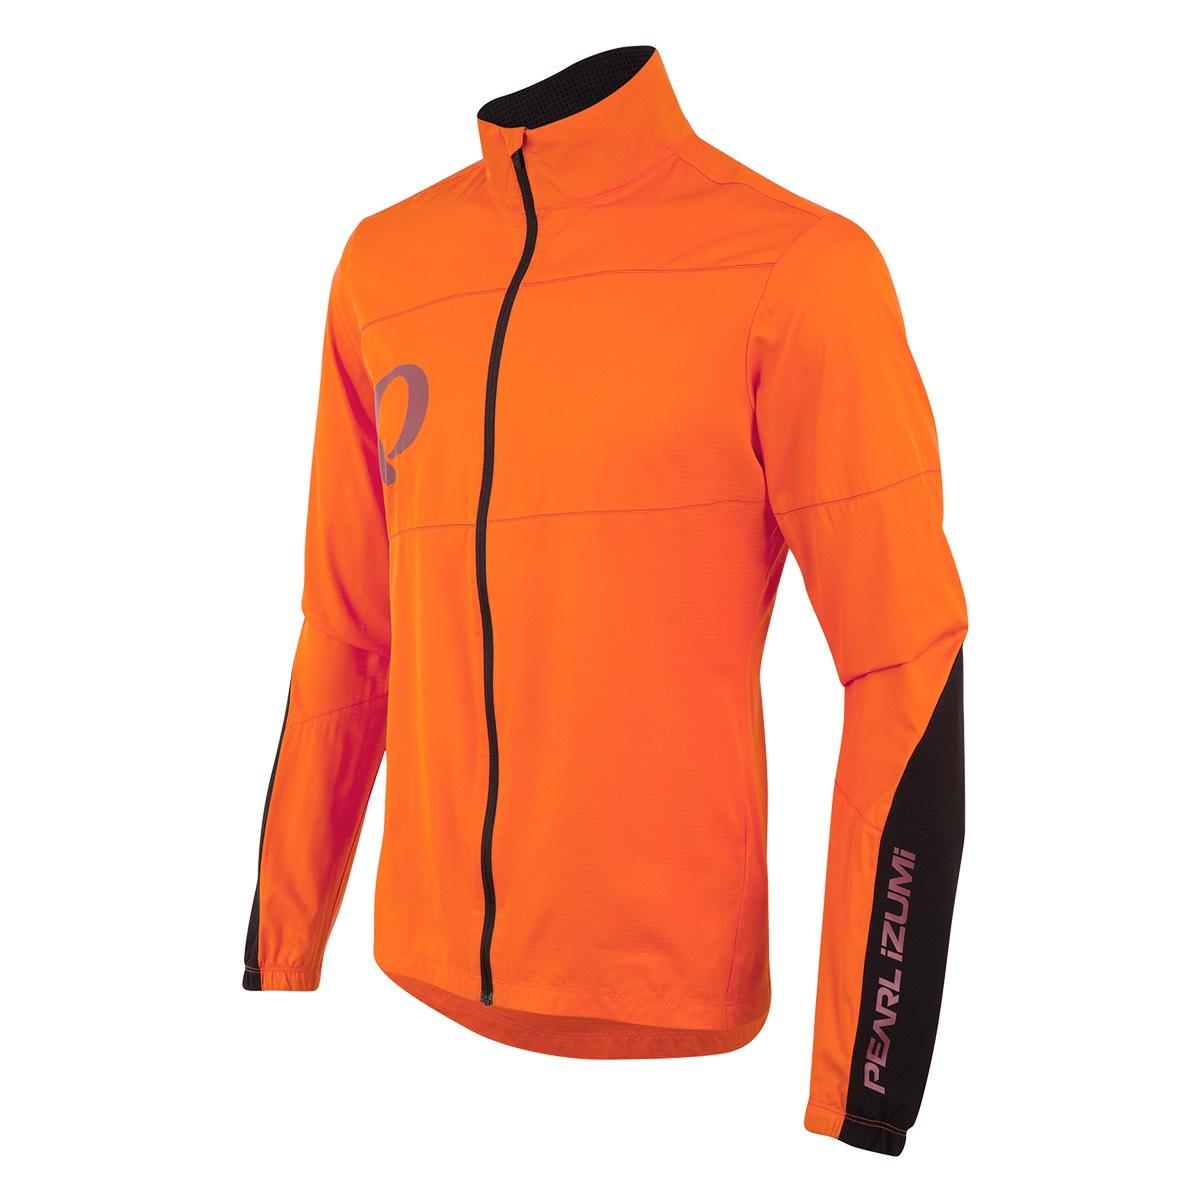 11131401062XLBSY Pearl Izumi MTB Barrier Jacket